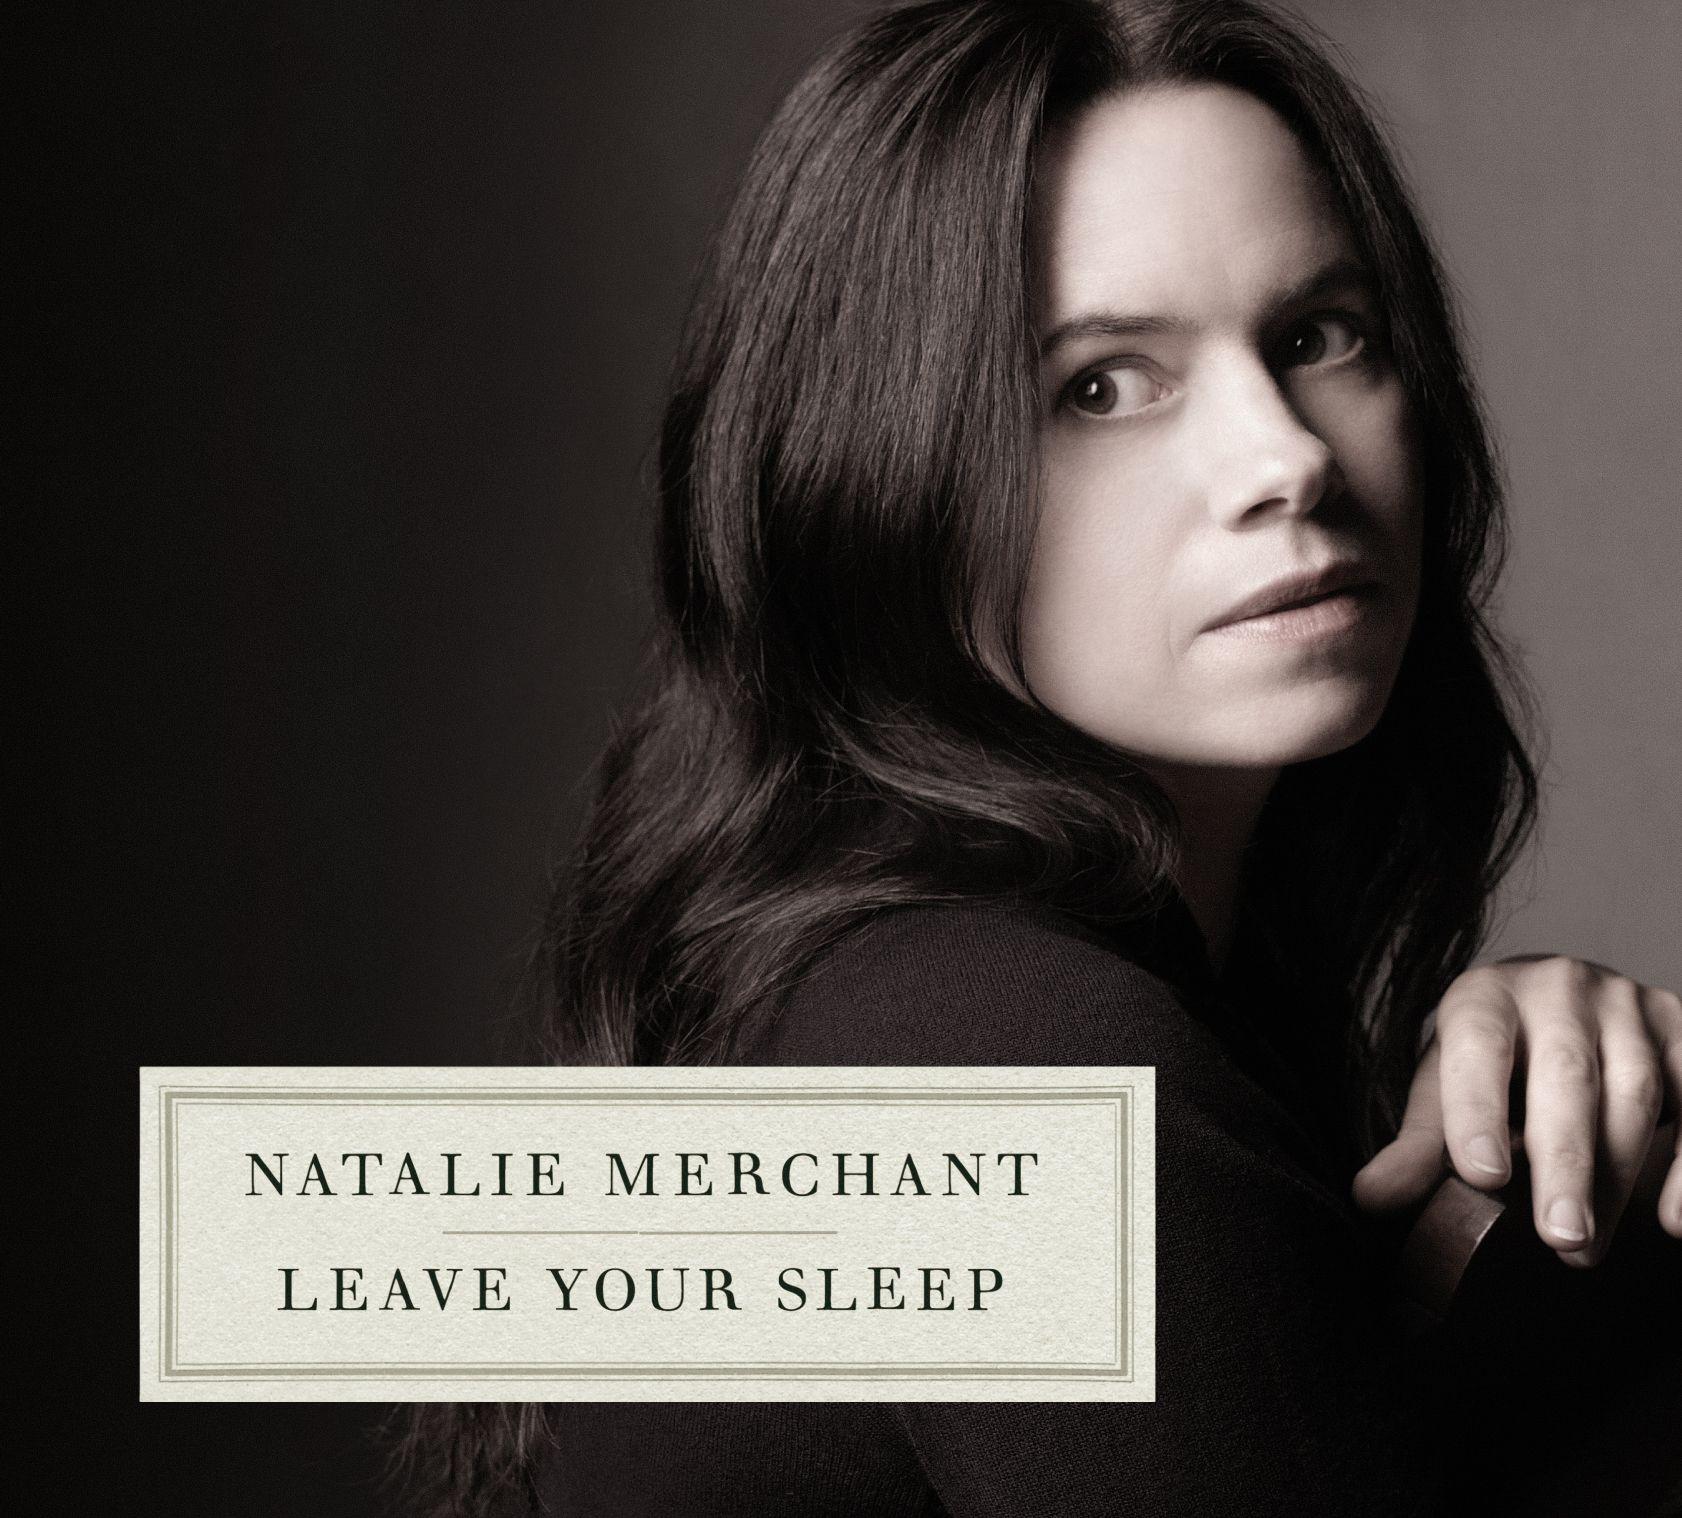 Natalie Merchant - Leave Your Sleep album cover